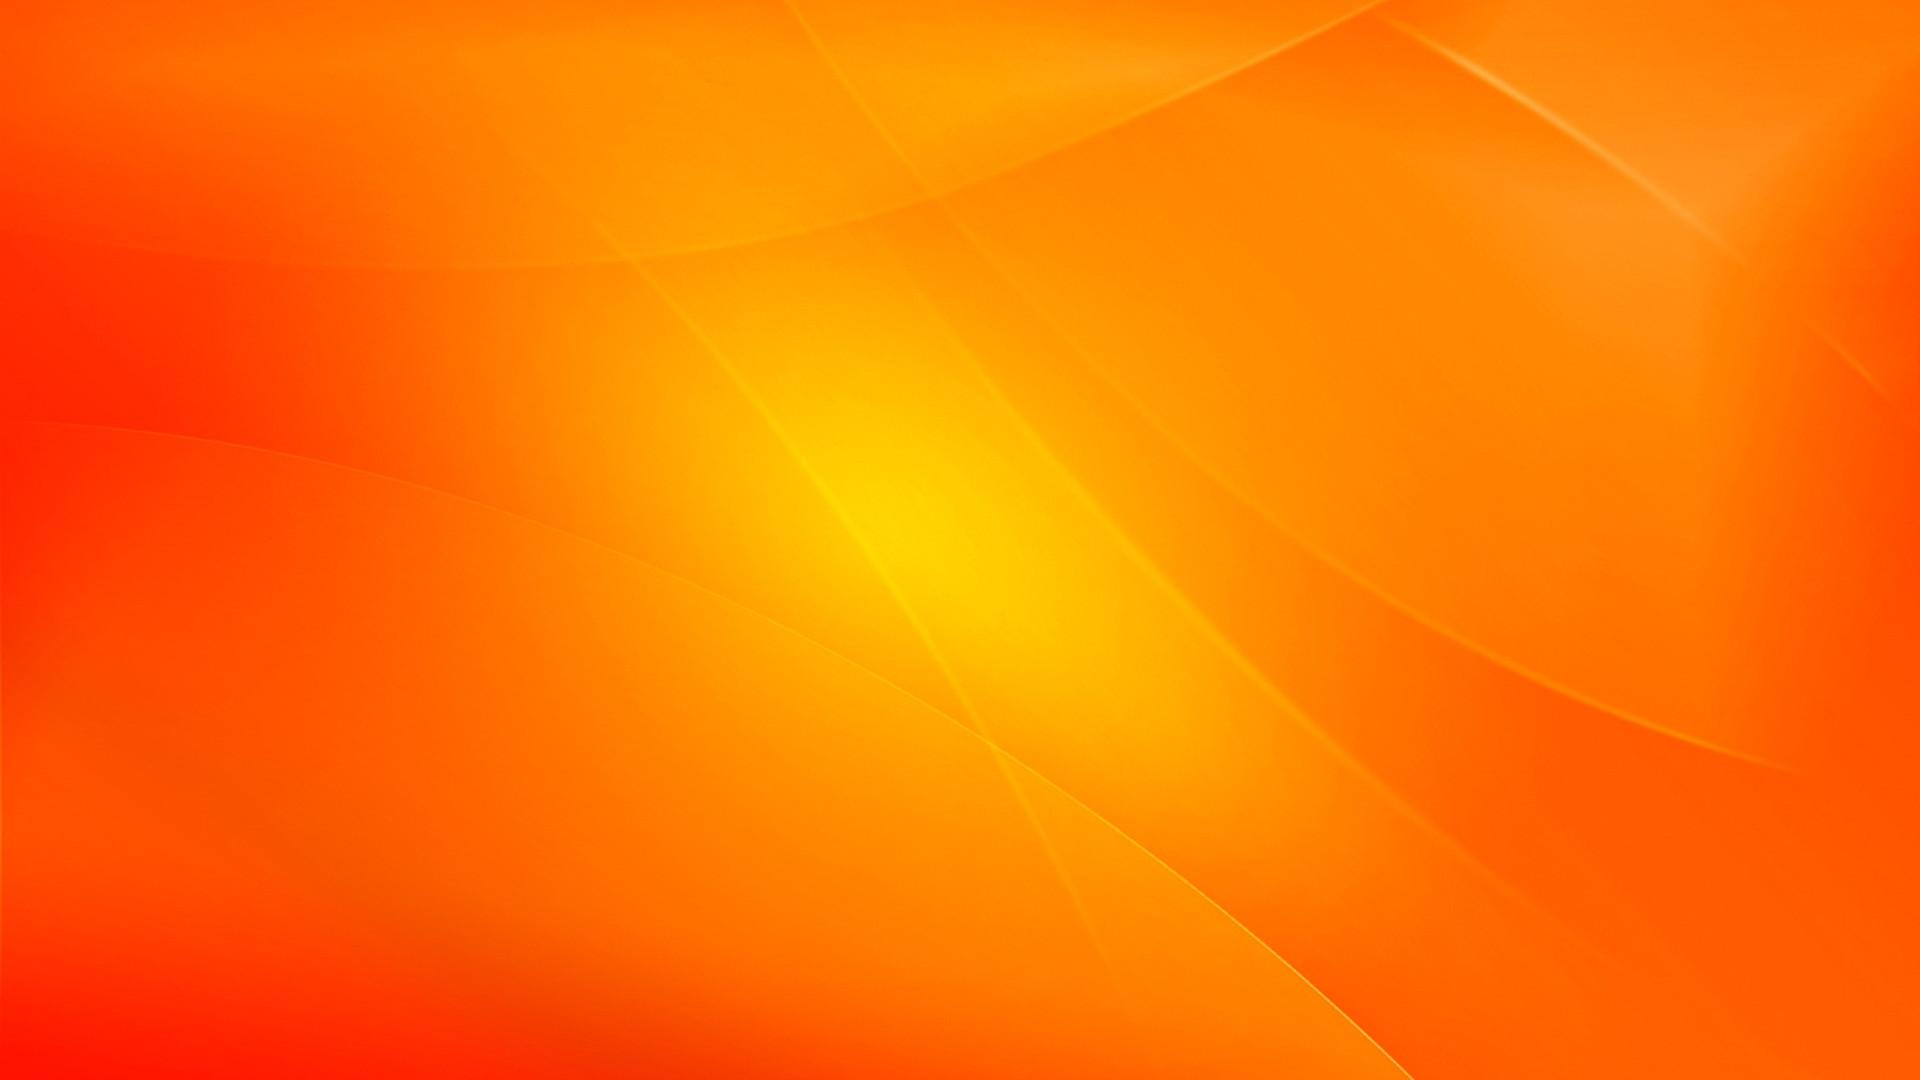 Orange Abstract Wallpaper Wallpapersafari